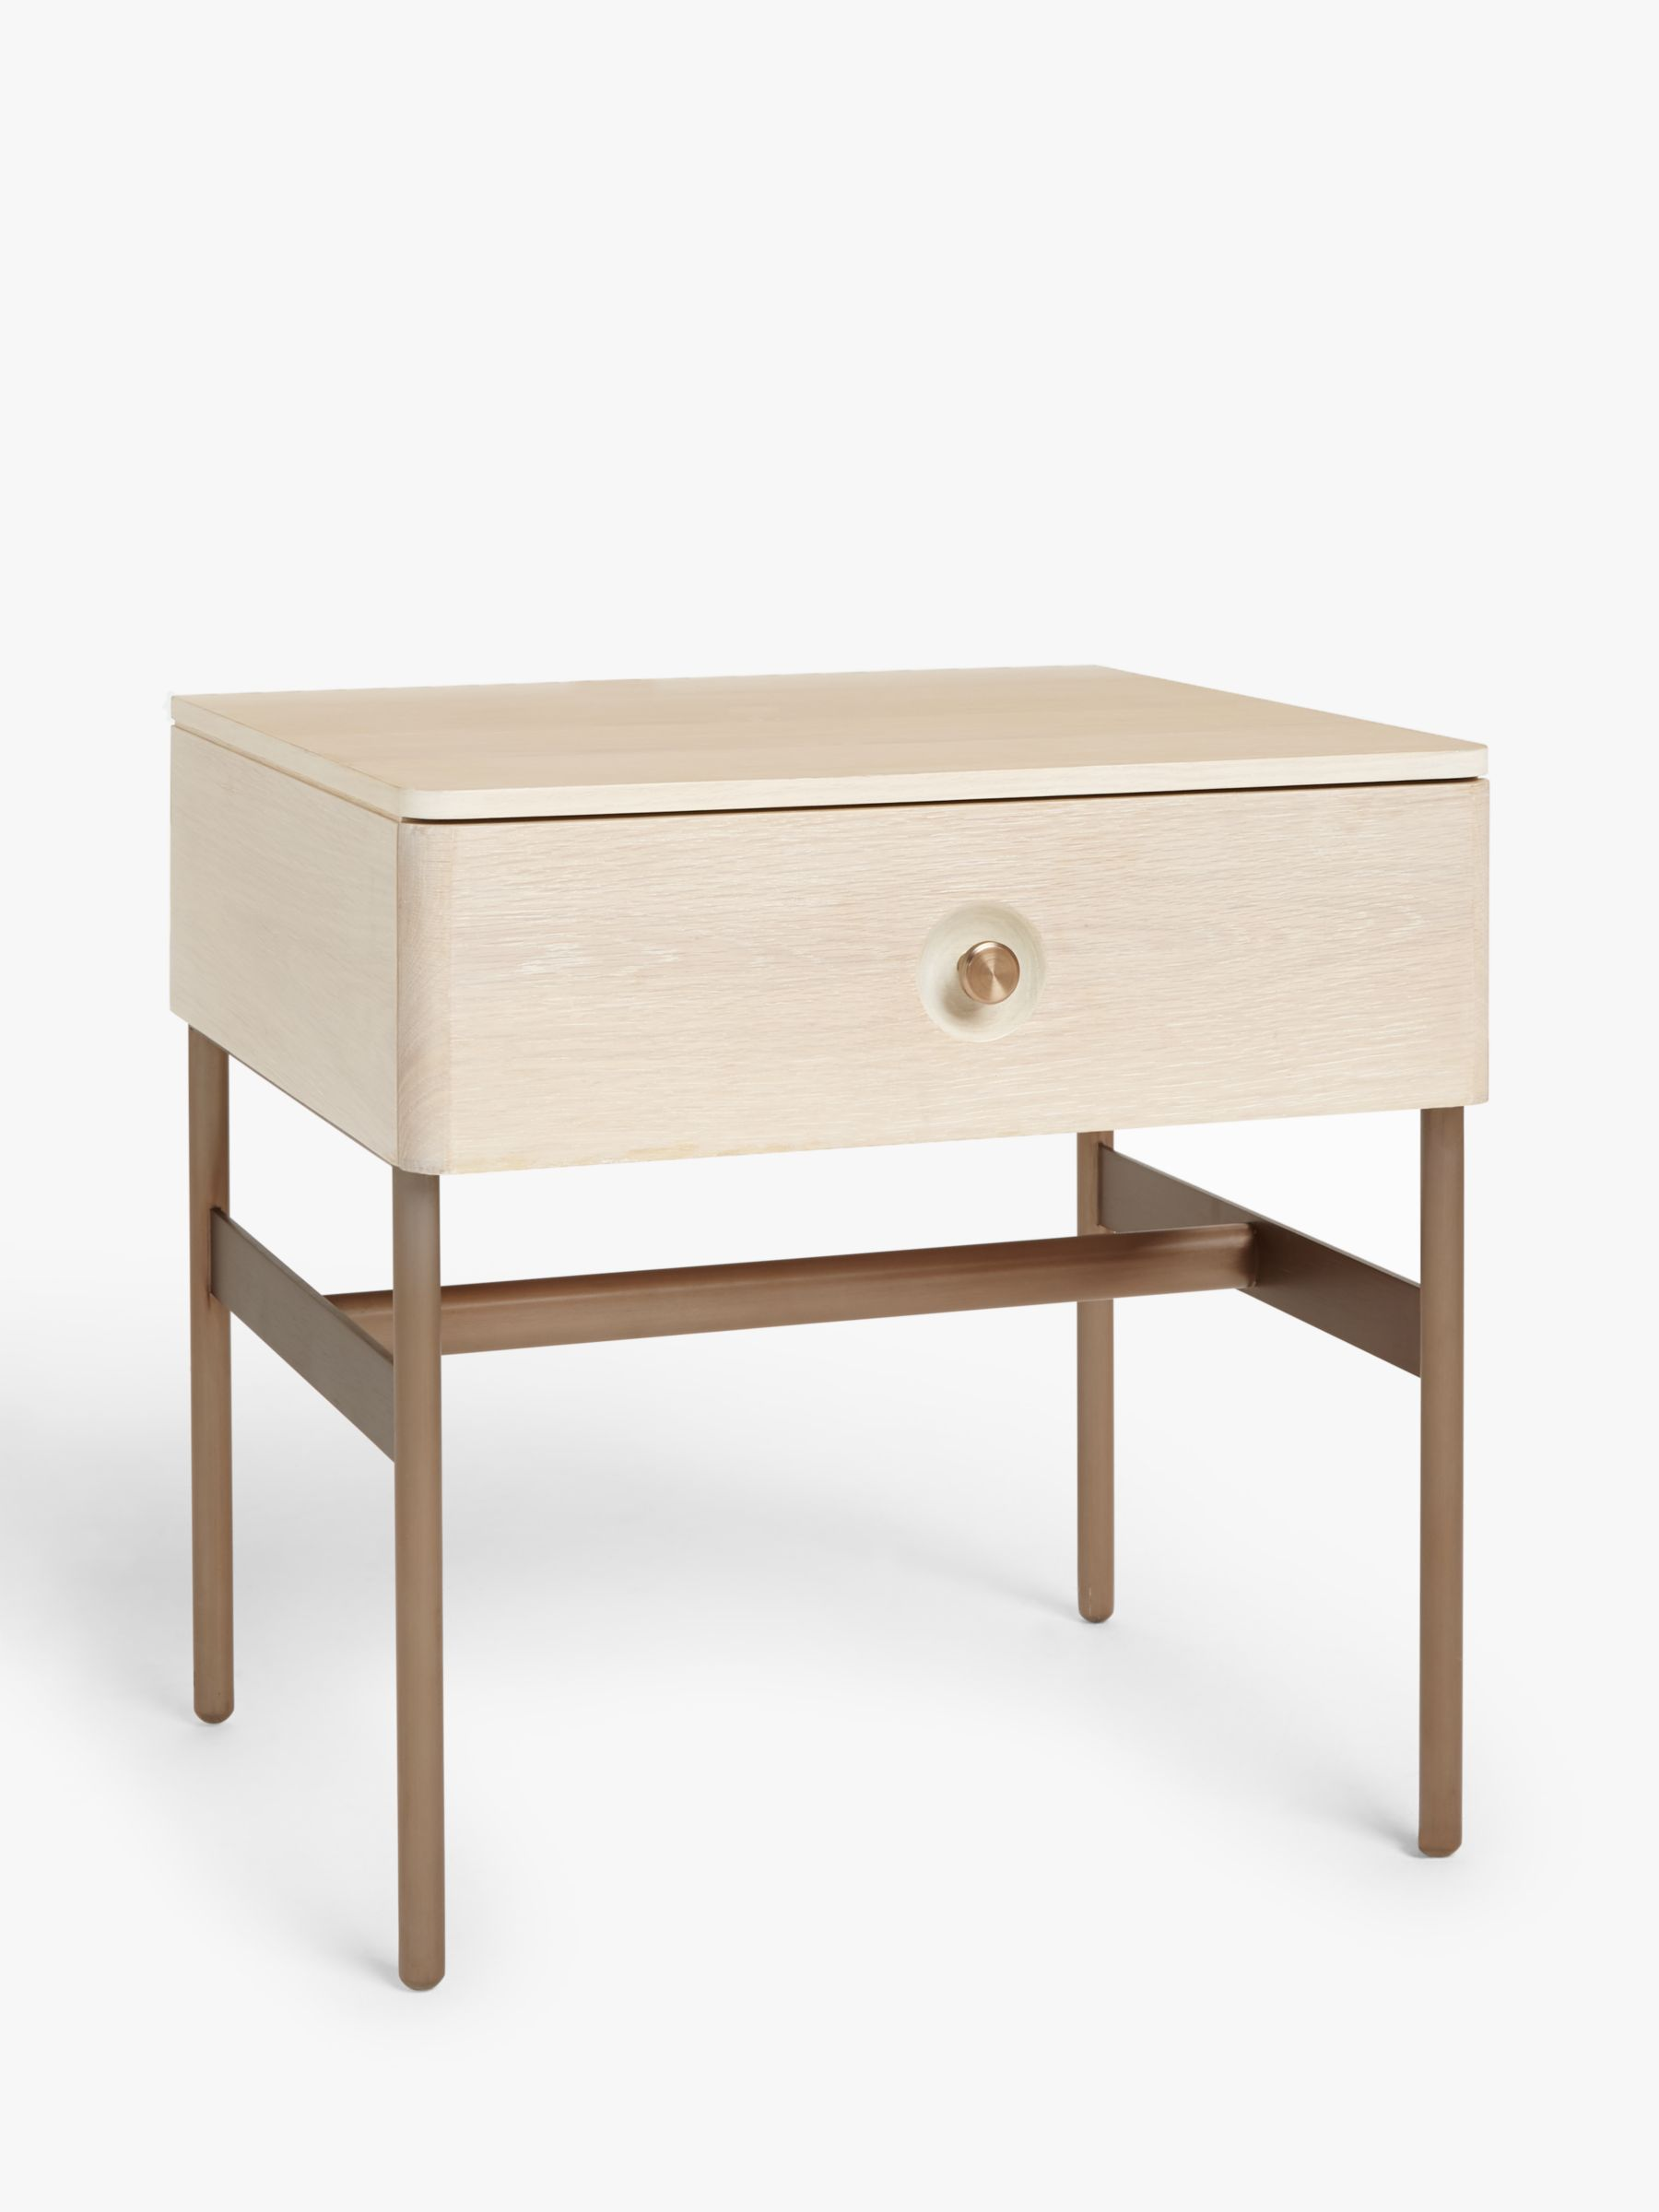 Design Project by John Lewis Design Project by John Lewis No.185 1 Drawer Bedside Table, Natural/Oak